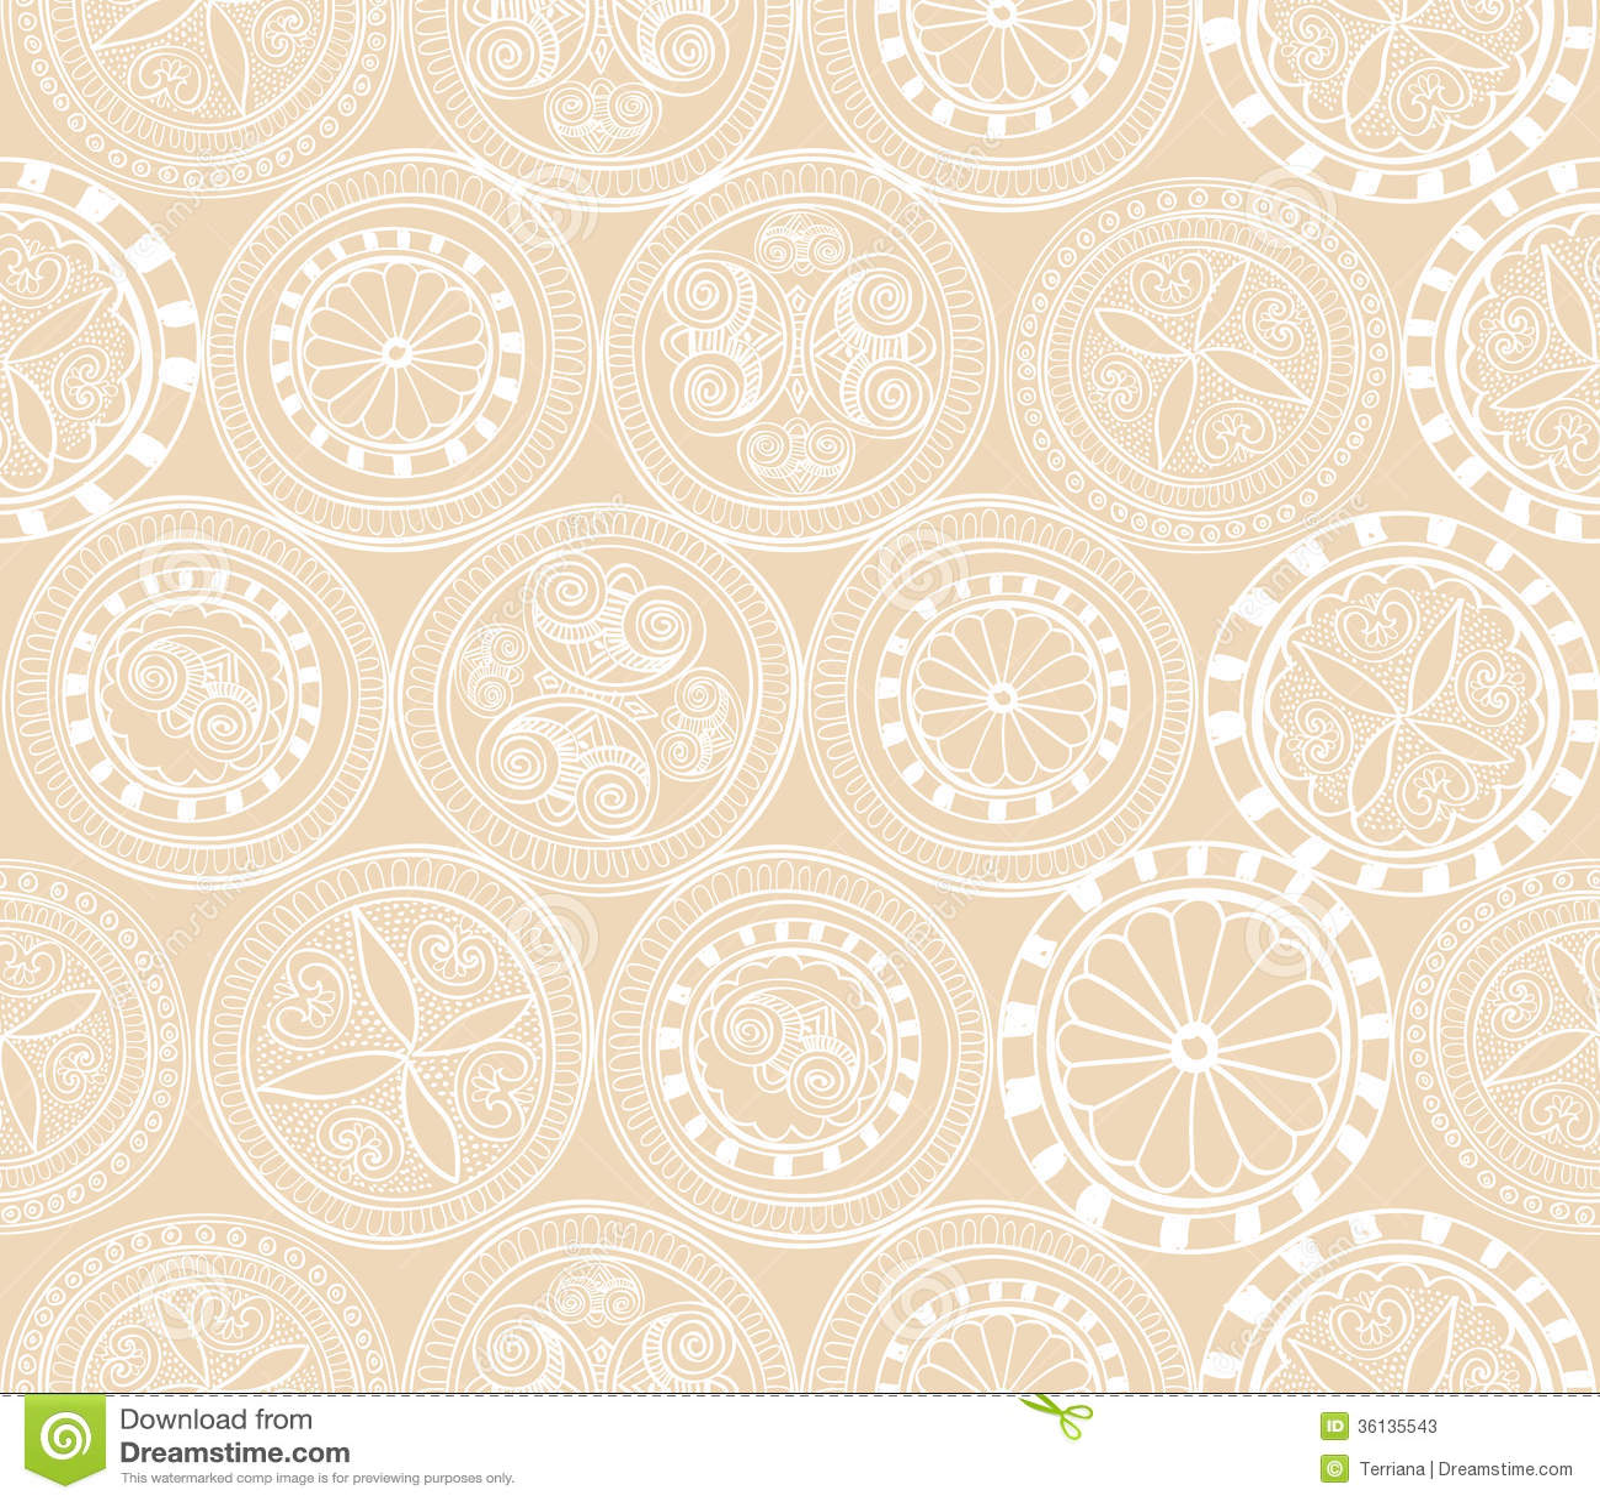 oriental wallpaper border